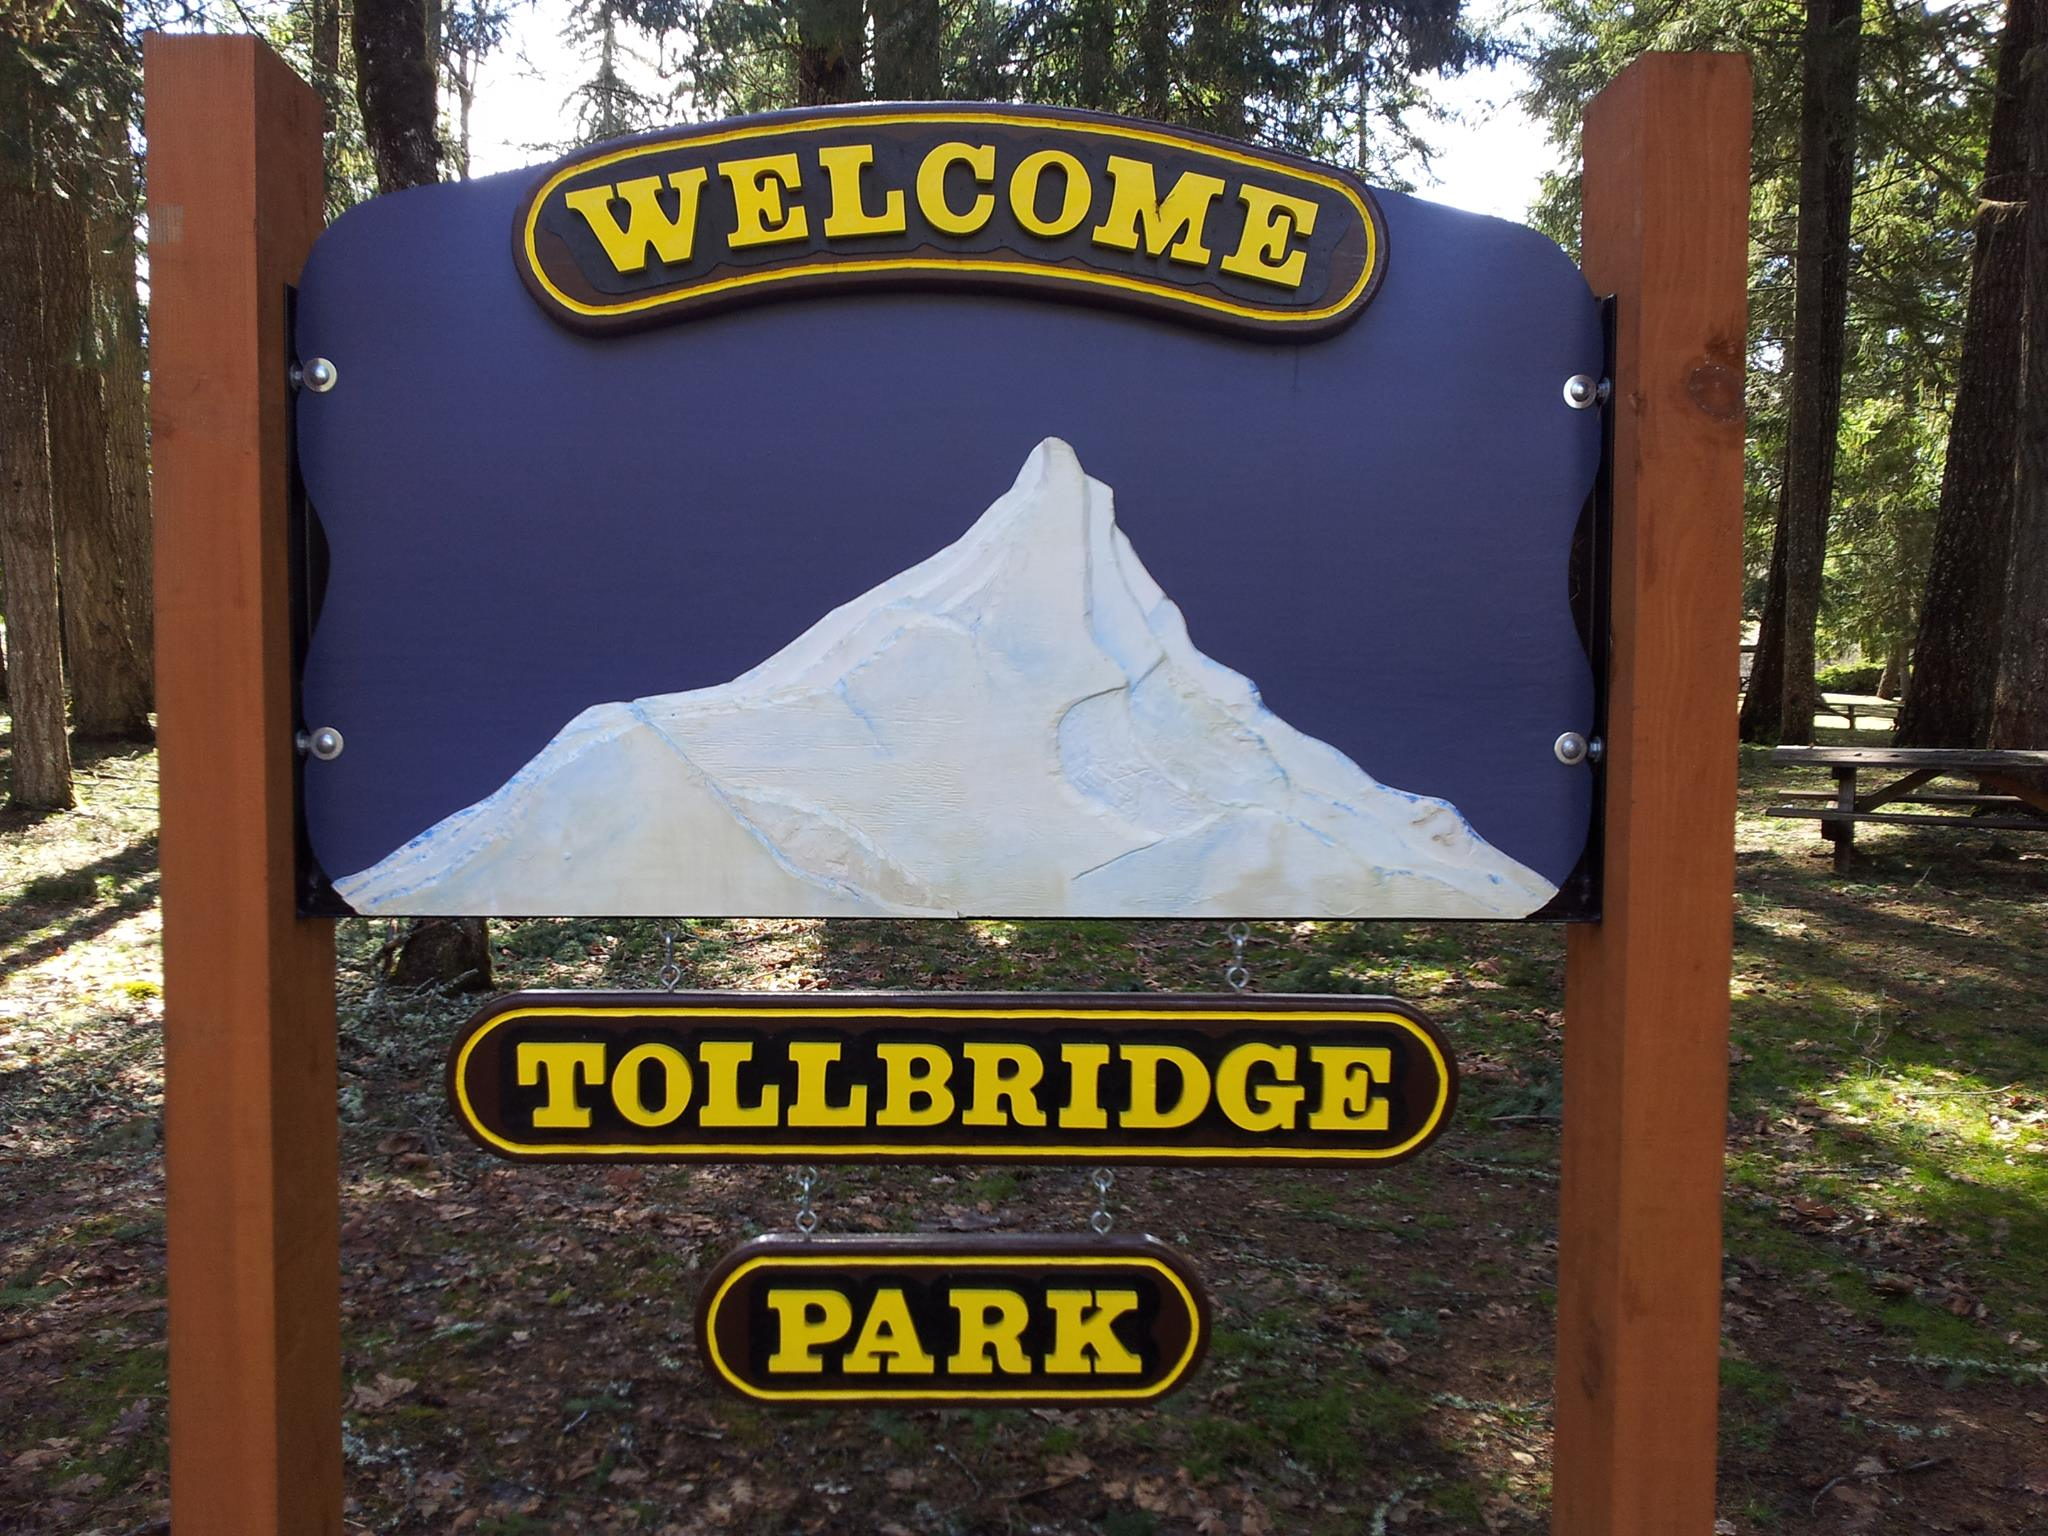 Toll Bridge Park (image courtesy of Toll Bridge Park Facebook Page)